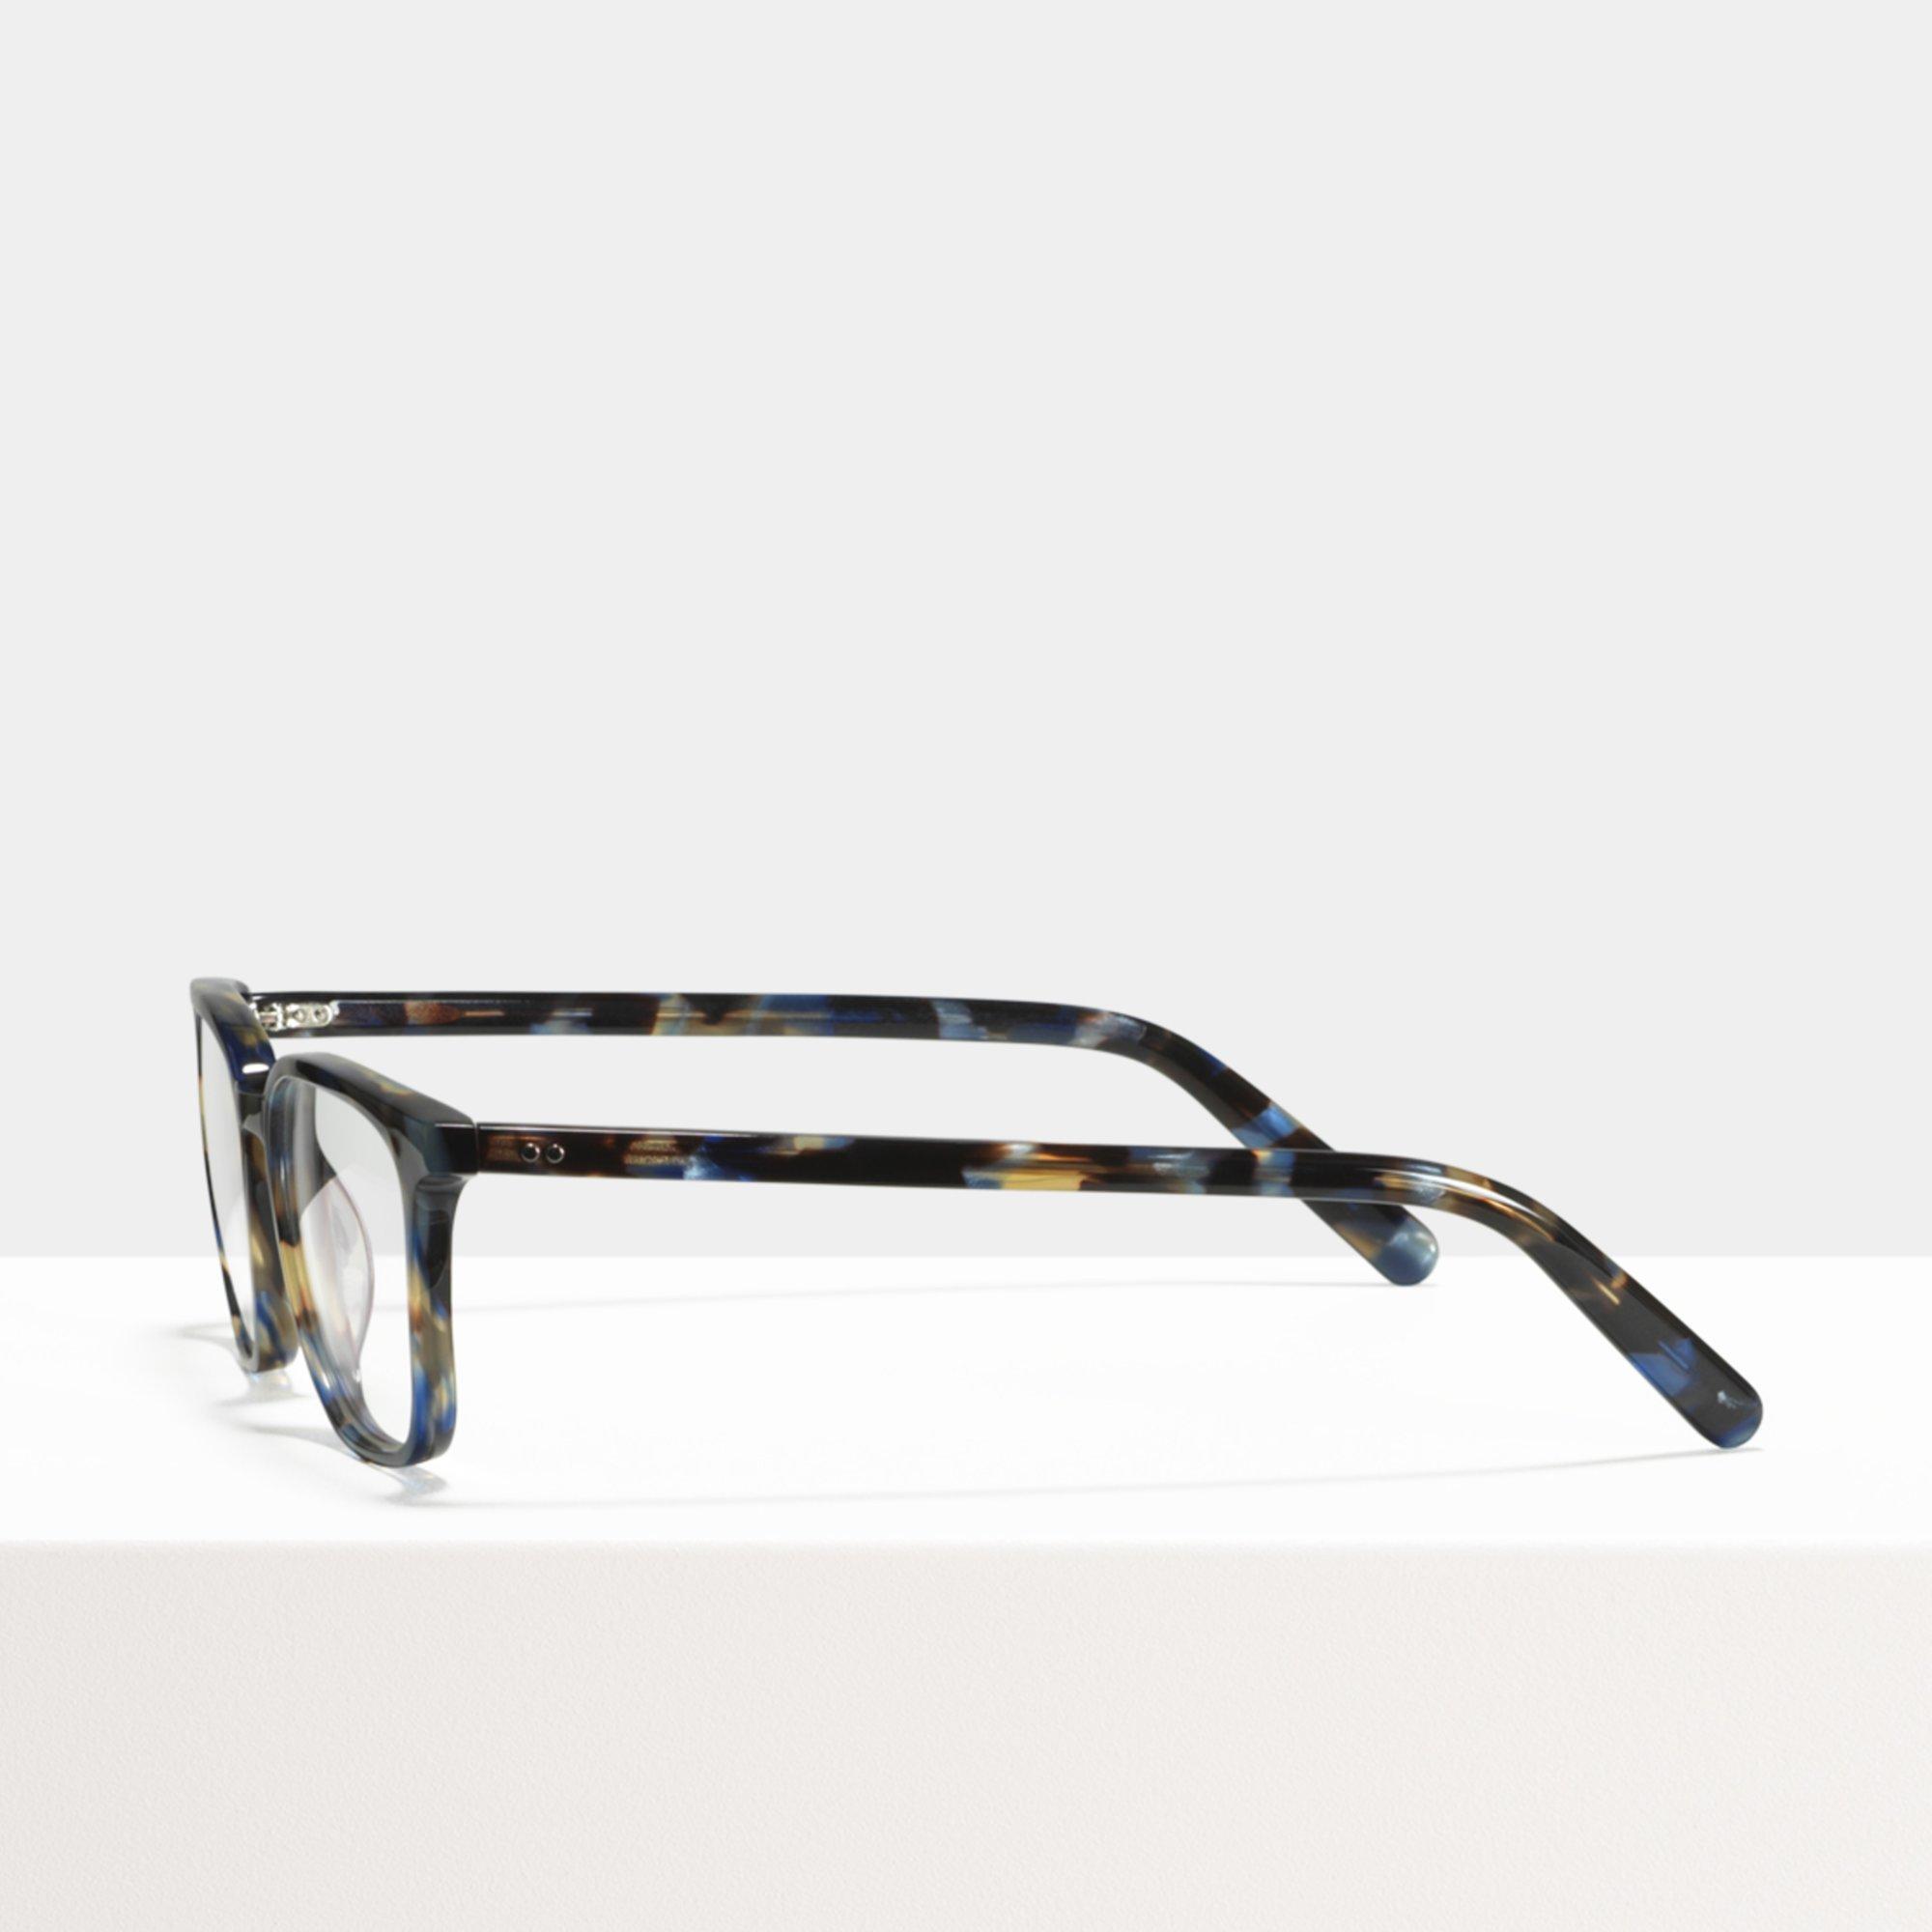 Ace & Tate Glasses | rechteckig Acetat in Blau, Braun